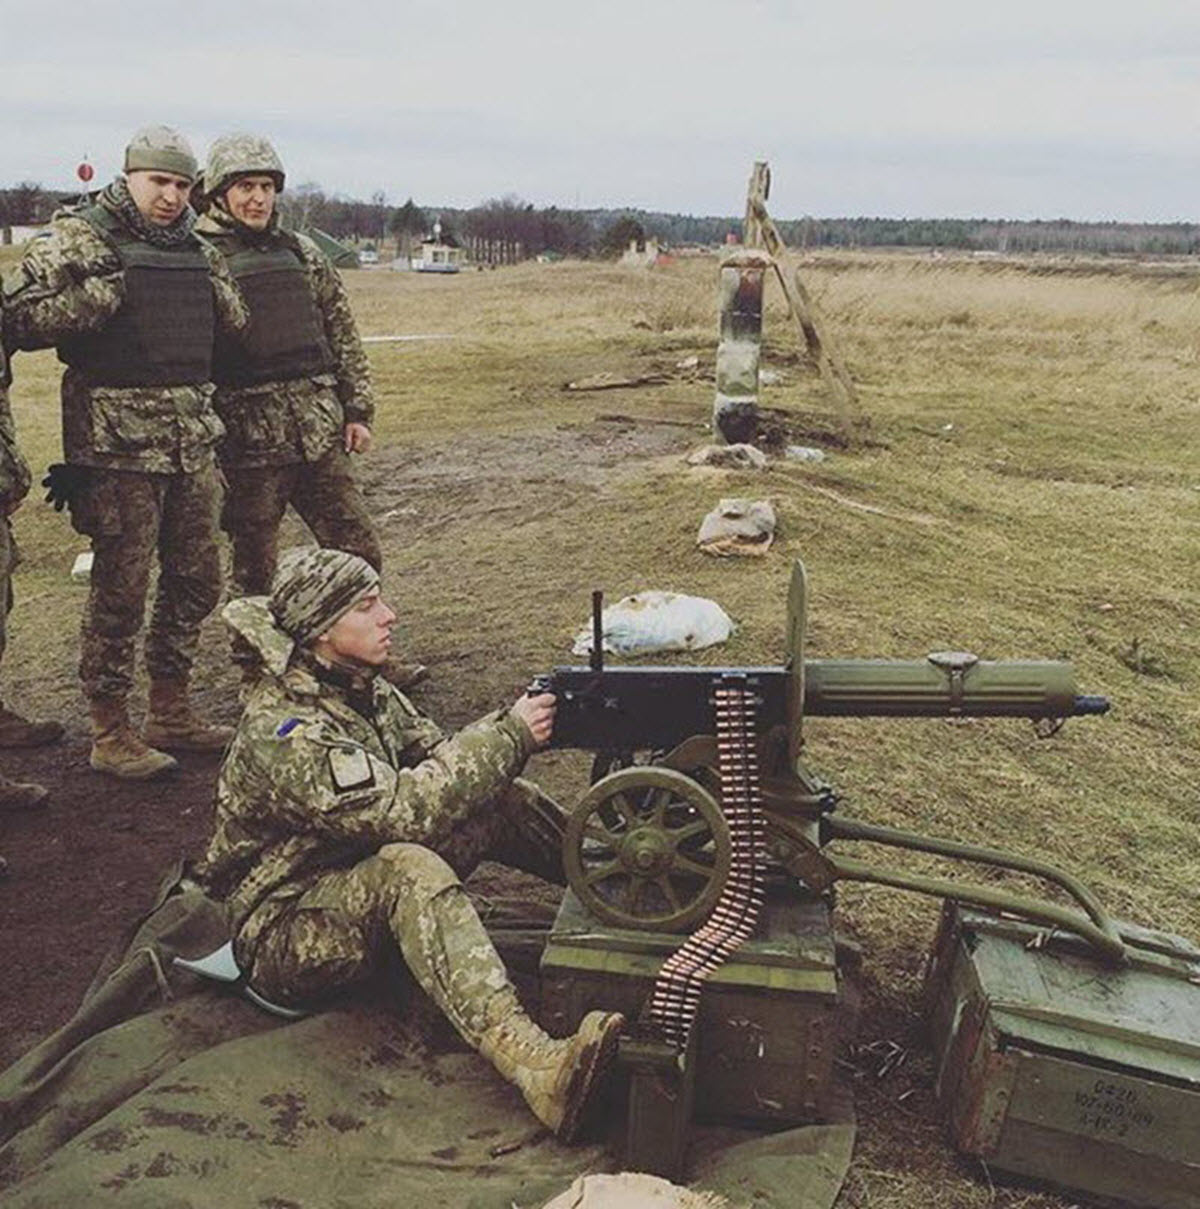 https://war-time.ru/images/blog/strelkovoe-orujie/pulemet/rossia-sssr/maksim-stanok/pod-1/ukraina-maksim-02.jpg